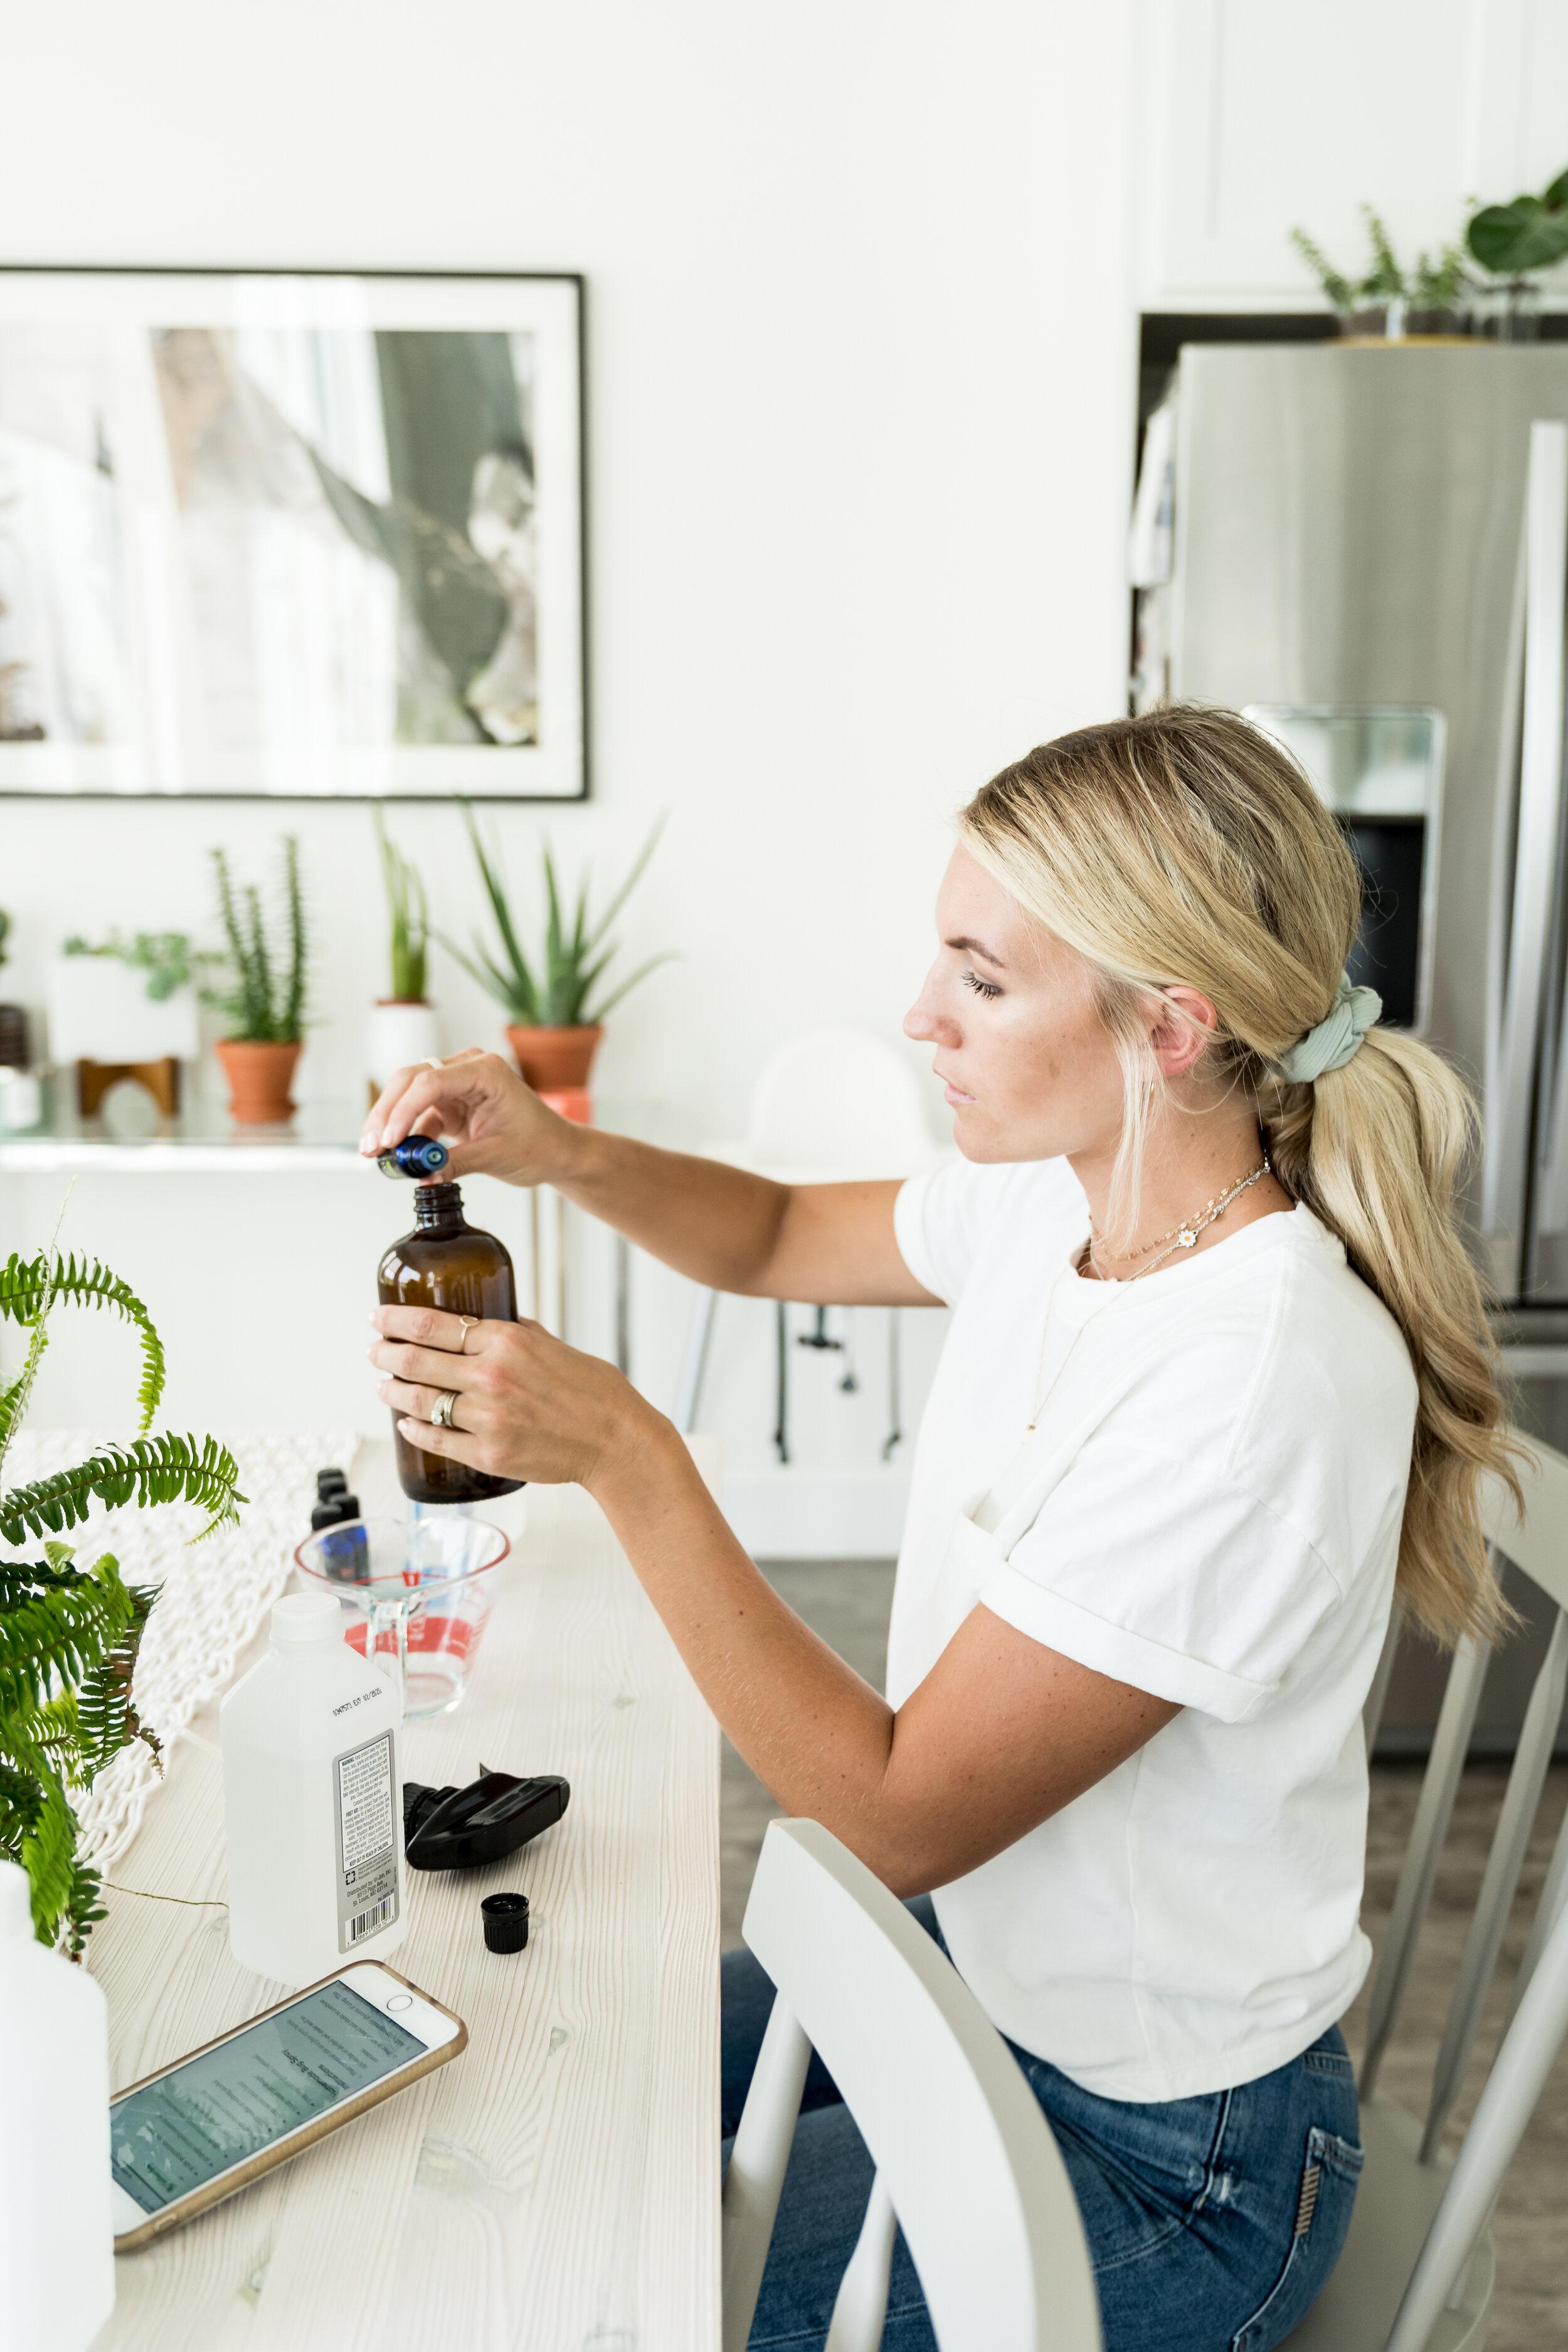 Slaty Blondes | Natural Bug Spray